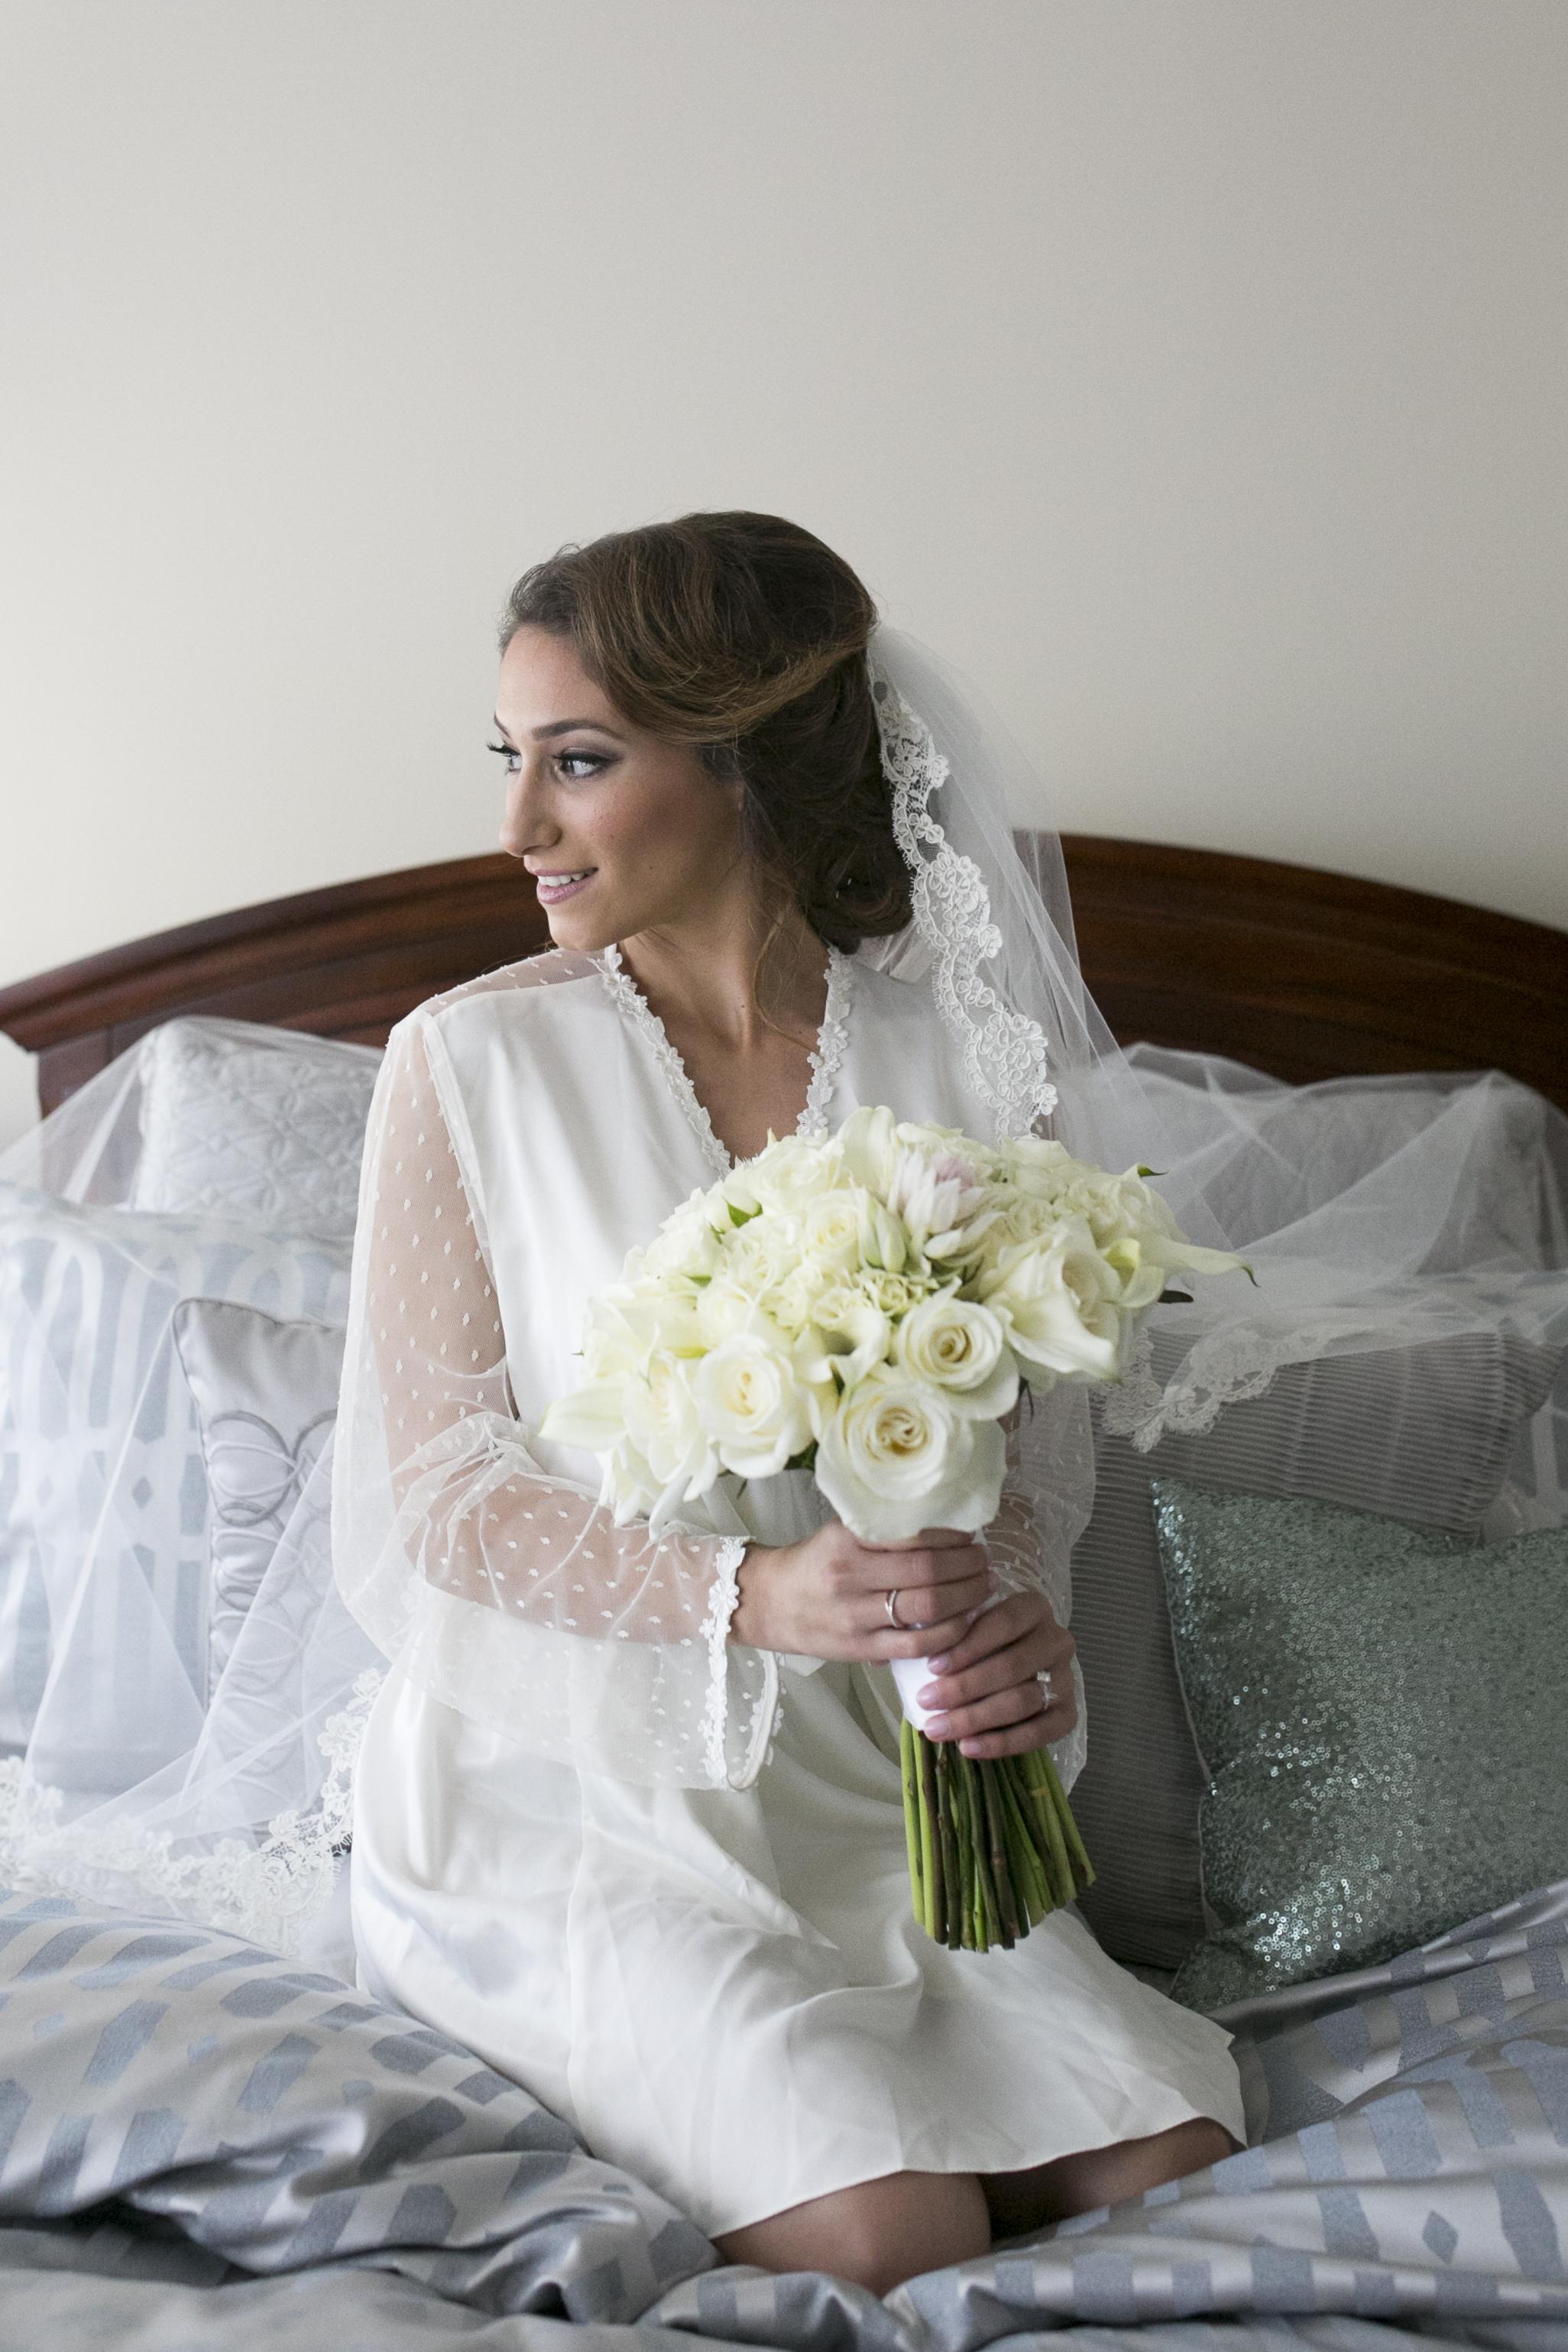 Persian Wedding-South San Francisco-Meo Baaklini14.jpg